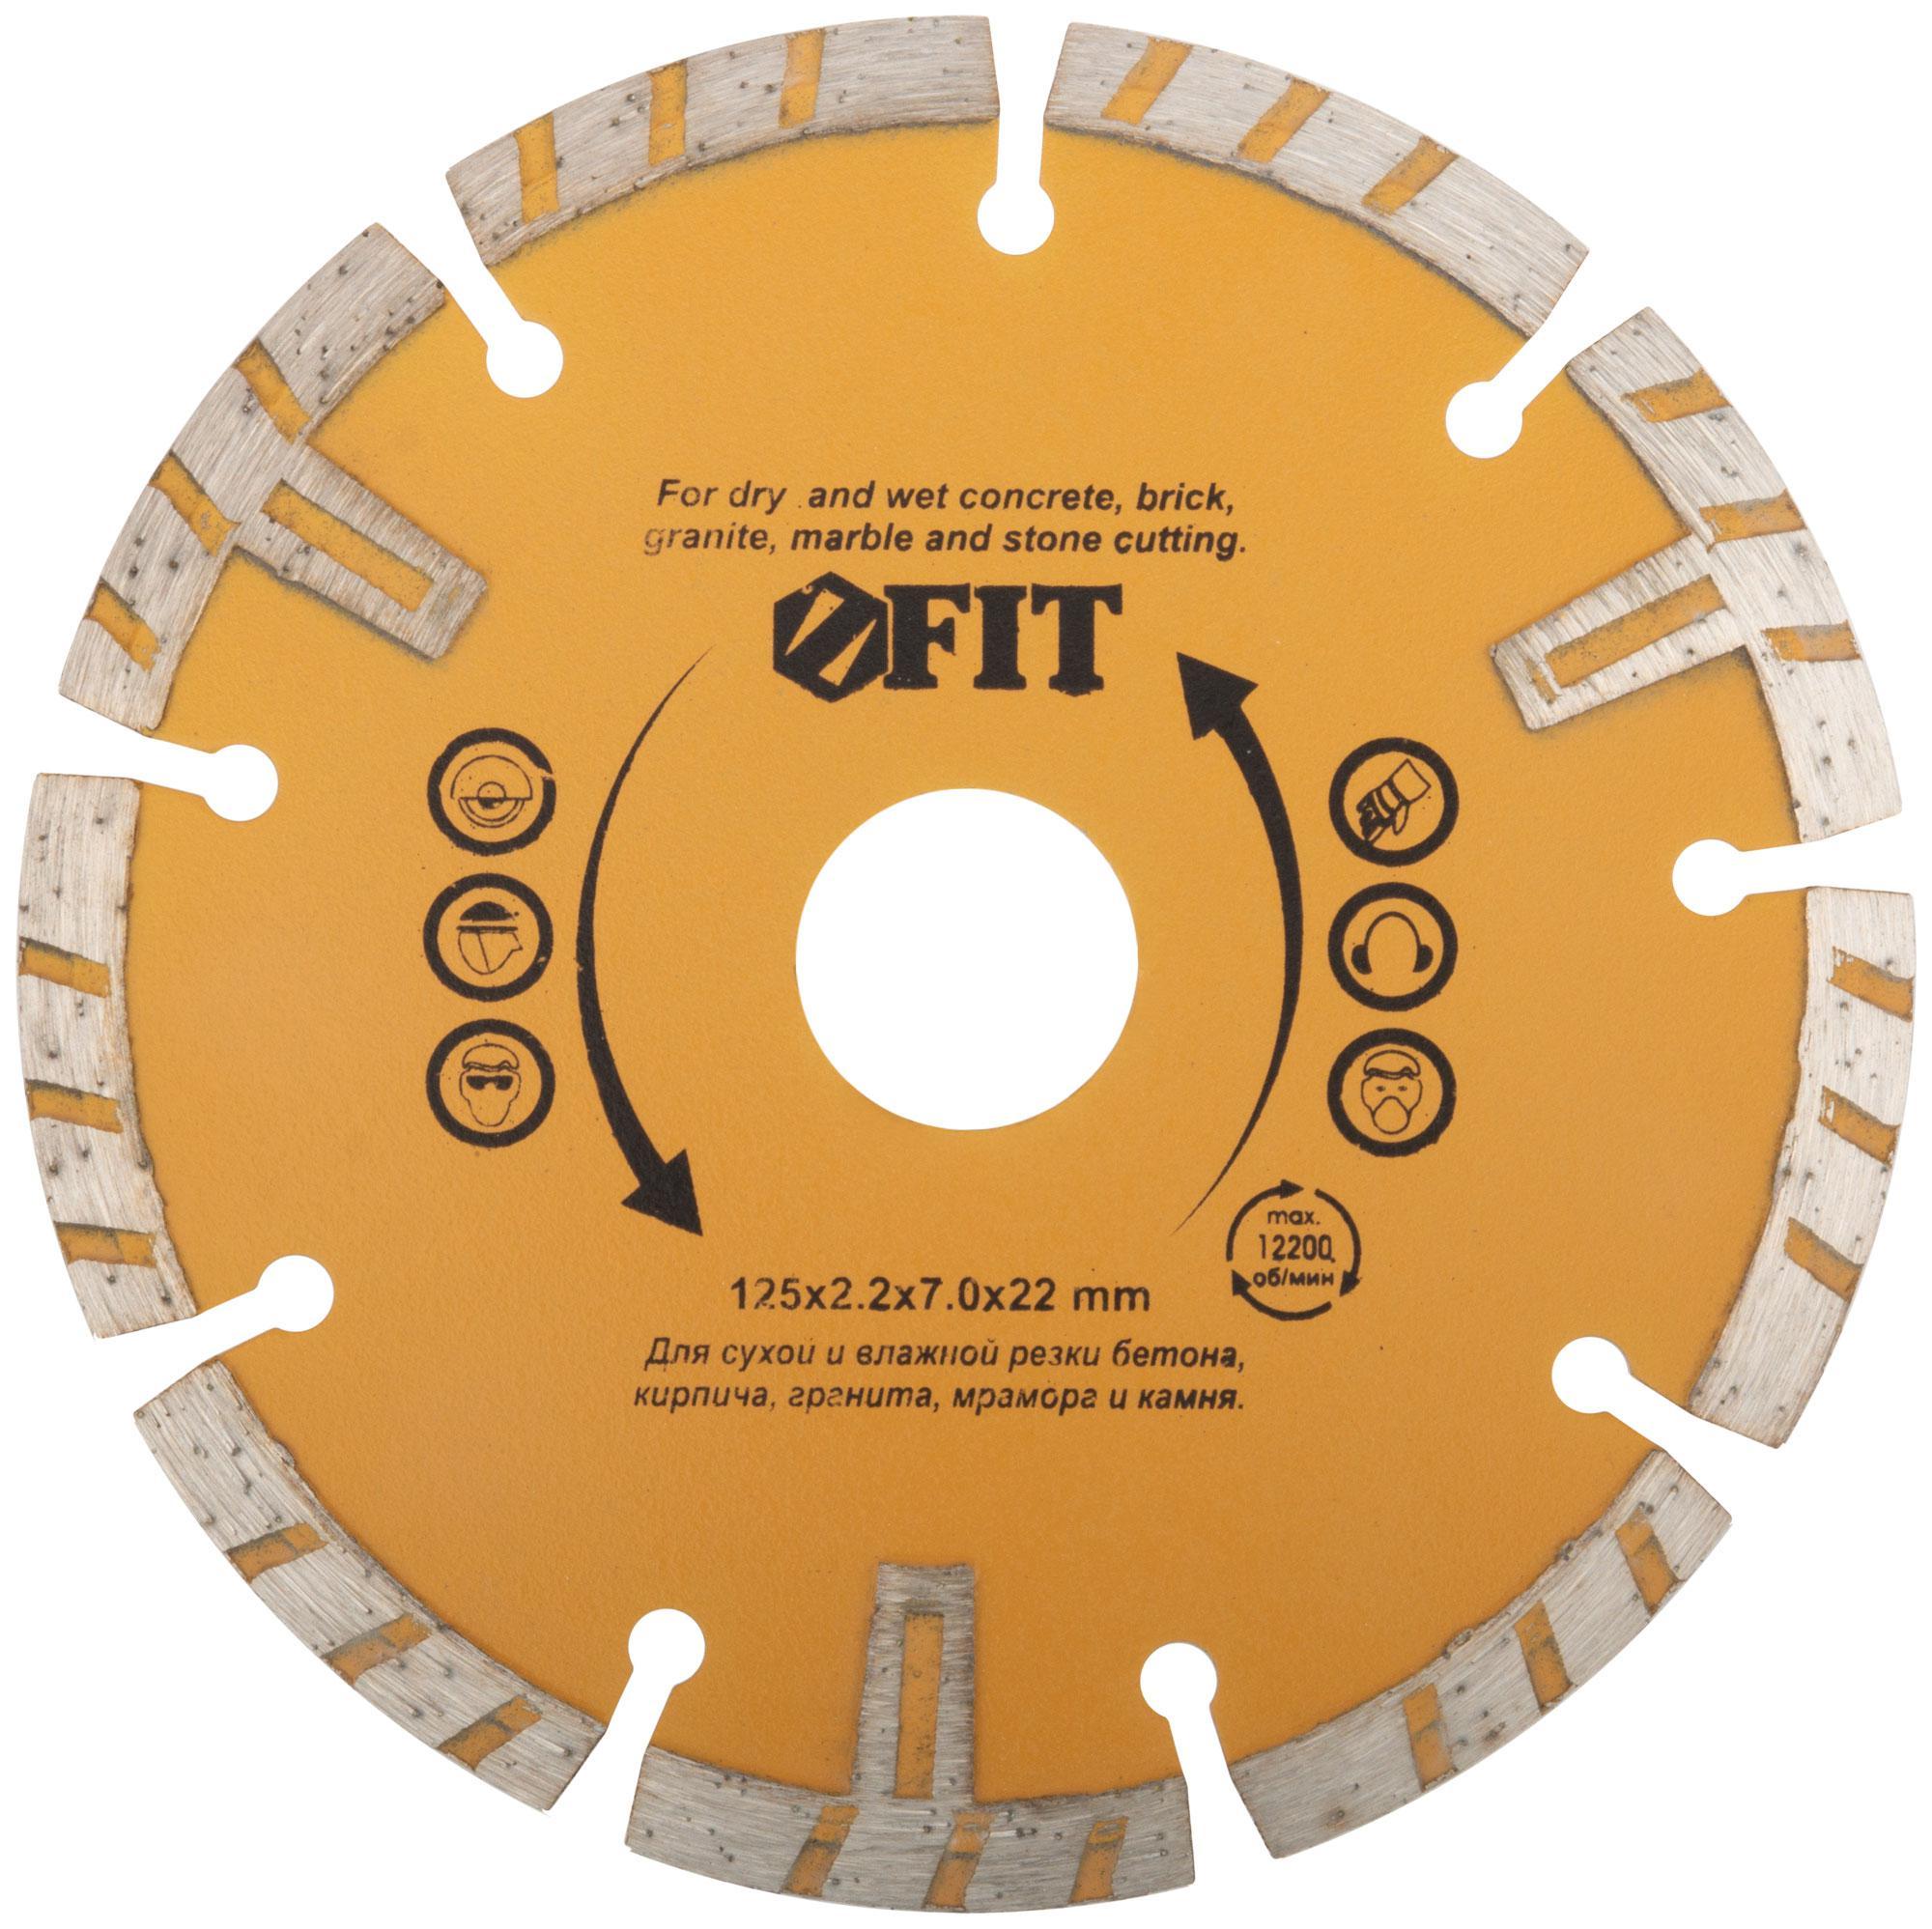 Круг алмазный Fit 37493 диск отрезной алмазный турбо 125х22 2mm 20007 ottom 125x22 2mm